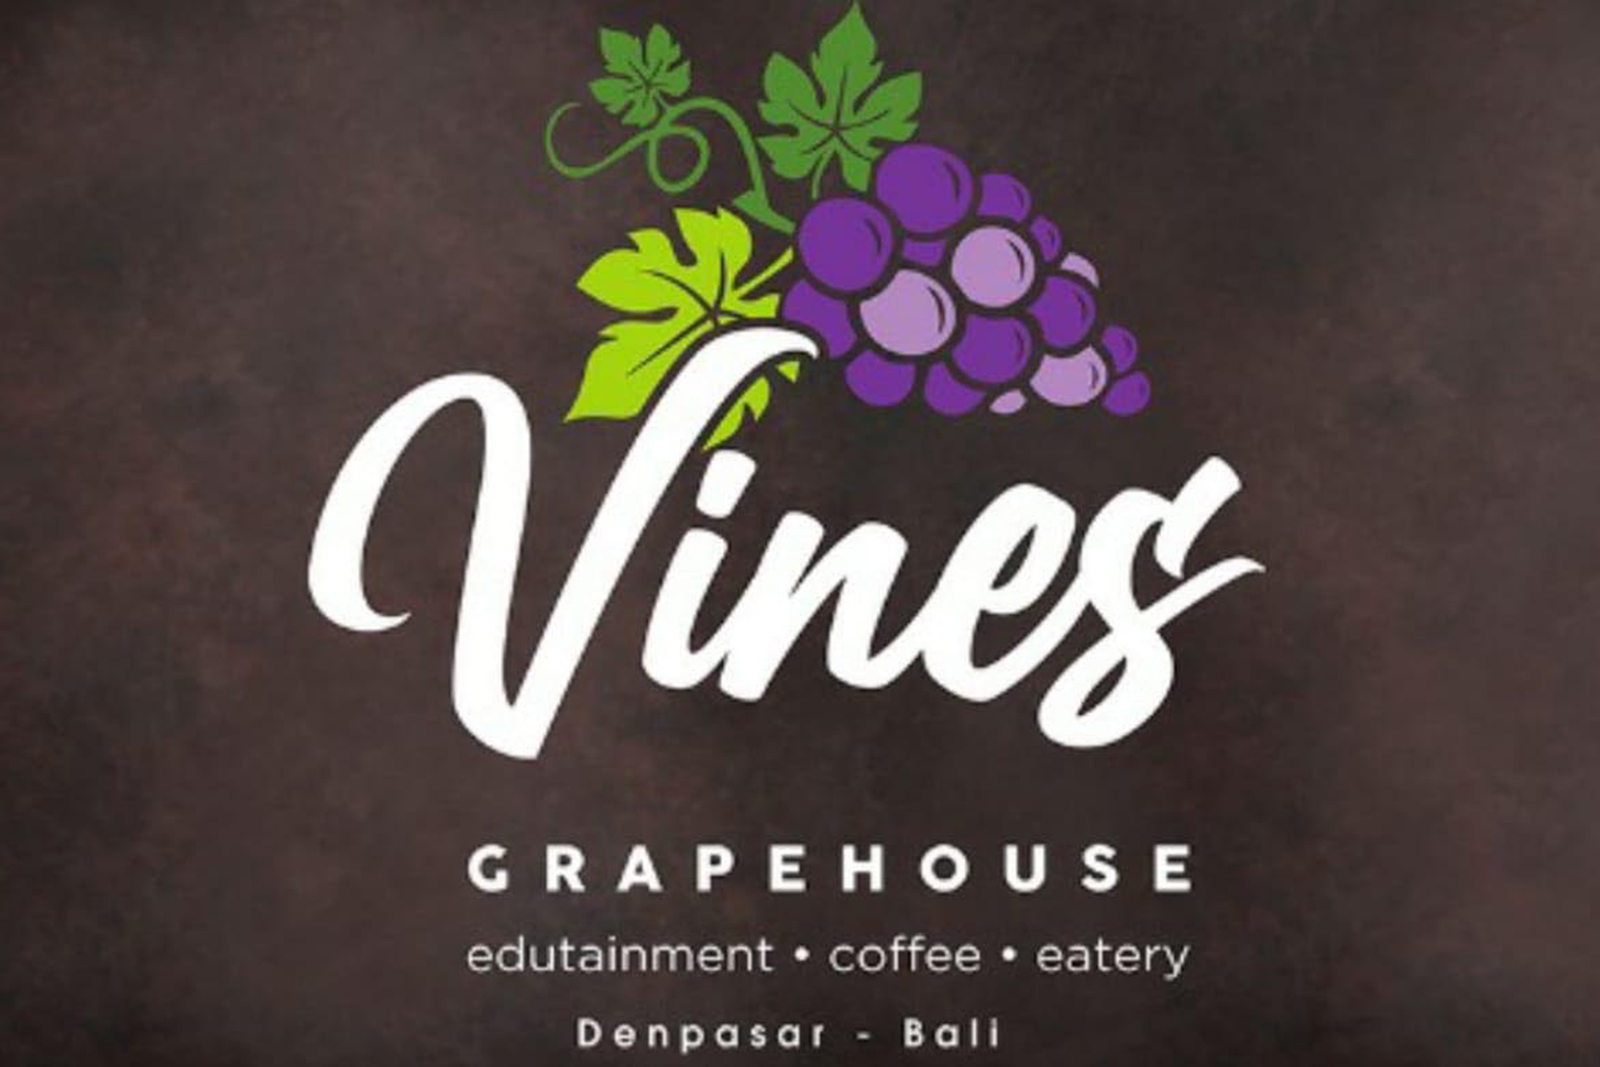 Vine - Exotic Grape House